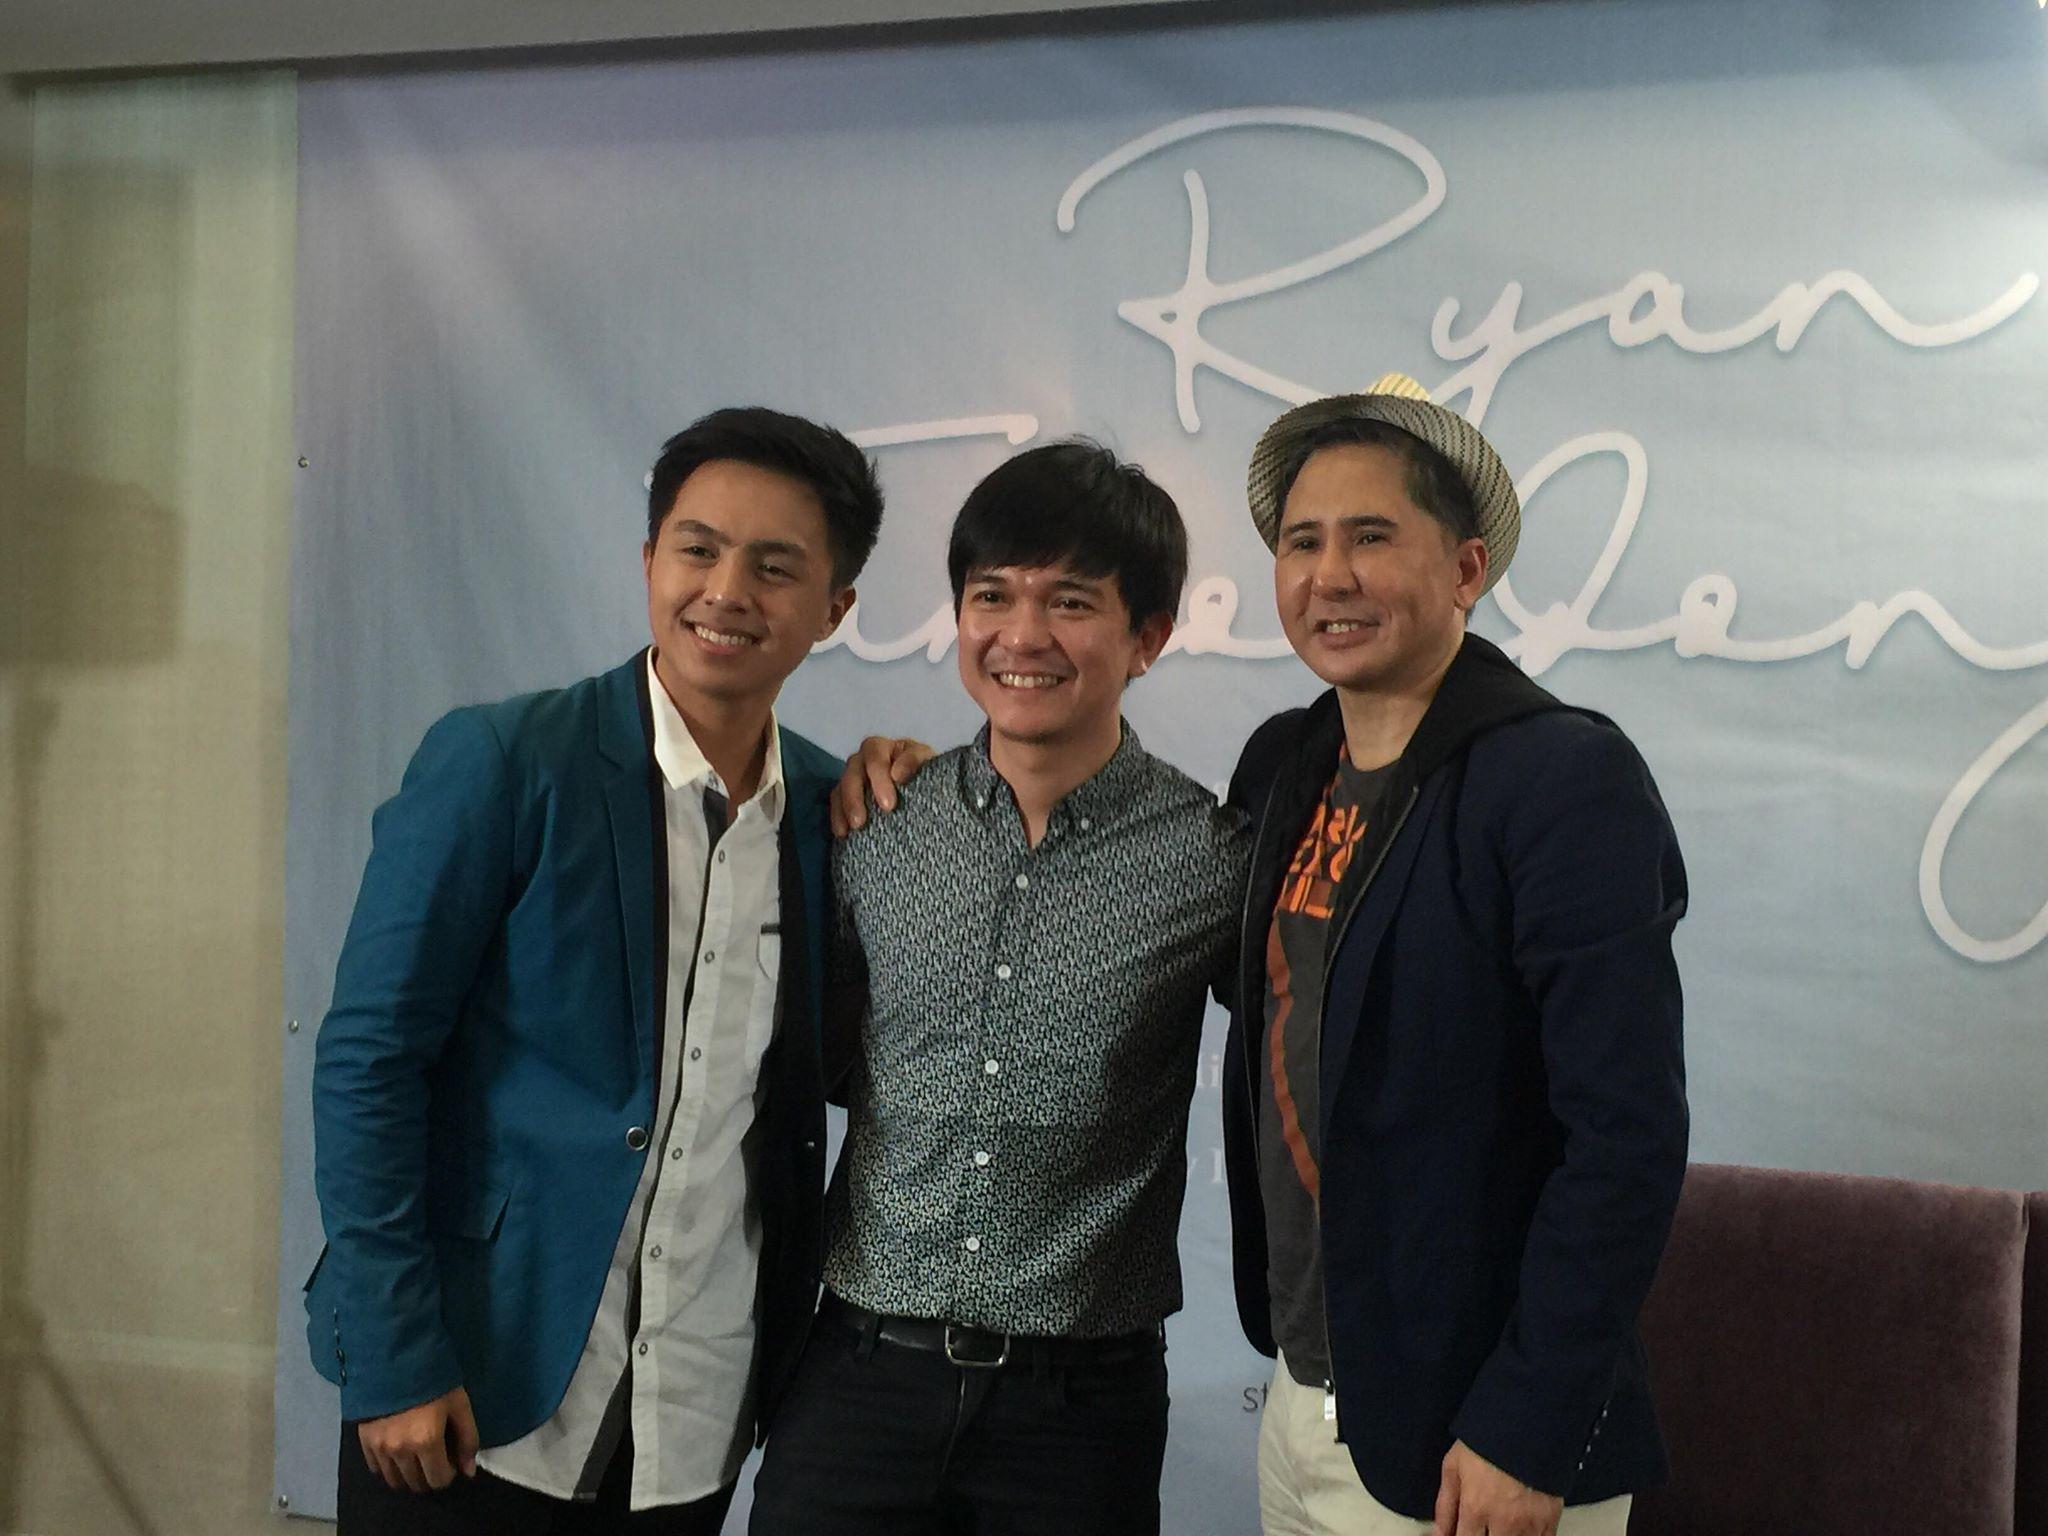 Ryan Tamondong, Star Music audio content head Jonathan Manalo, and manager Joel Mendoza